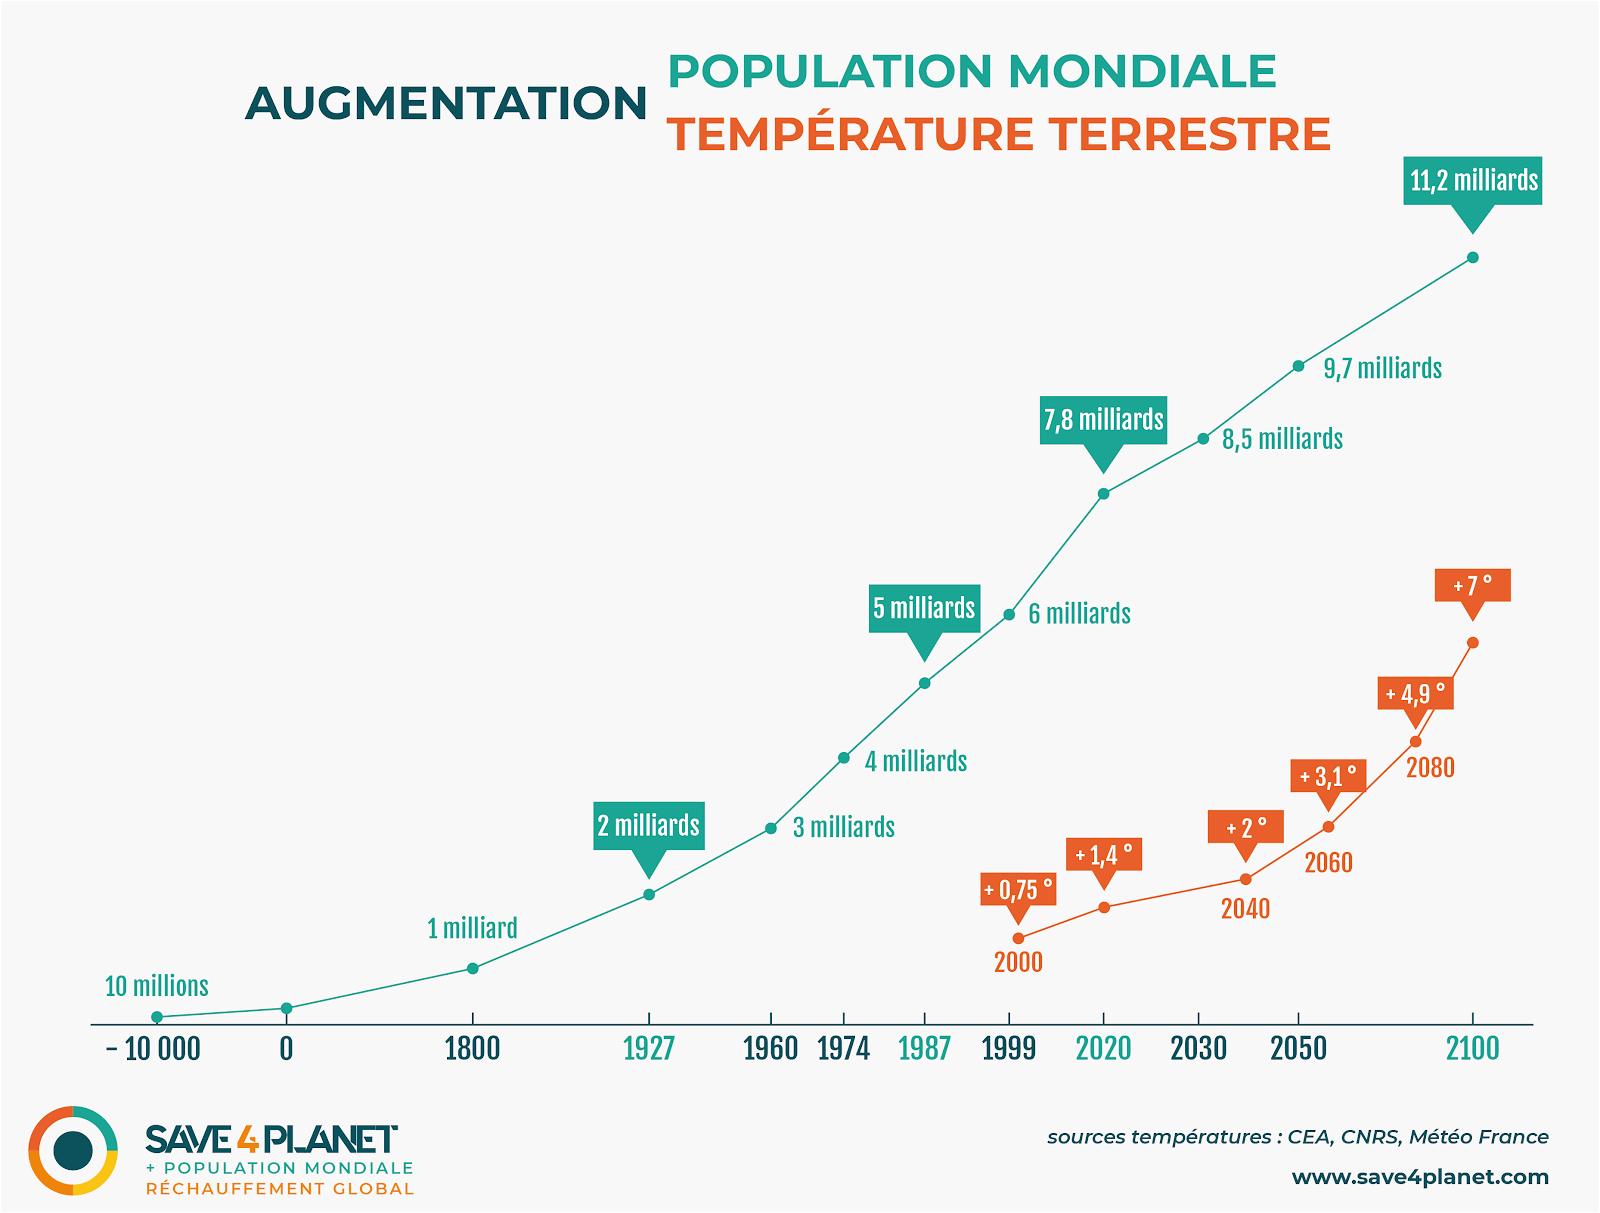 augmentation population augmentation temperature